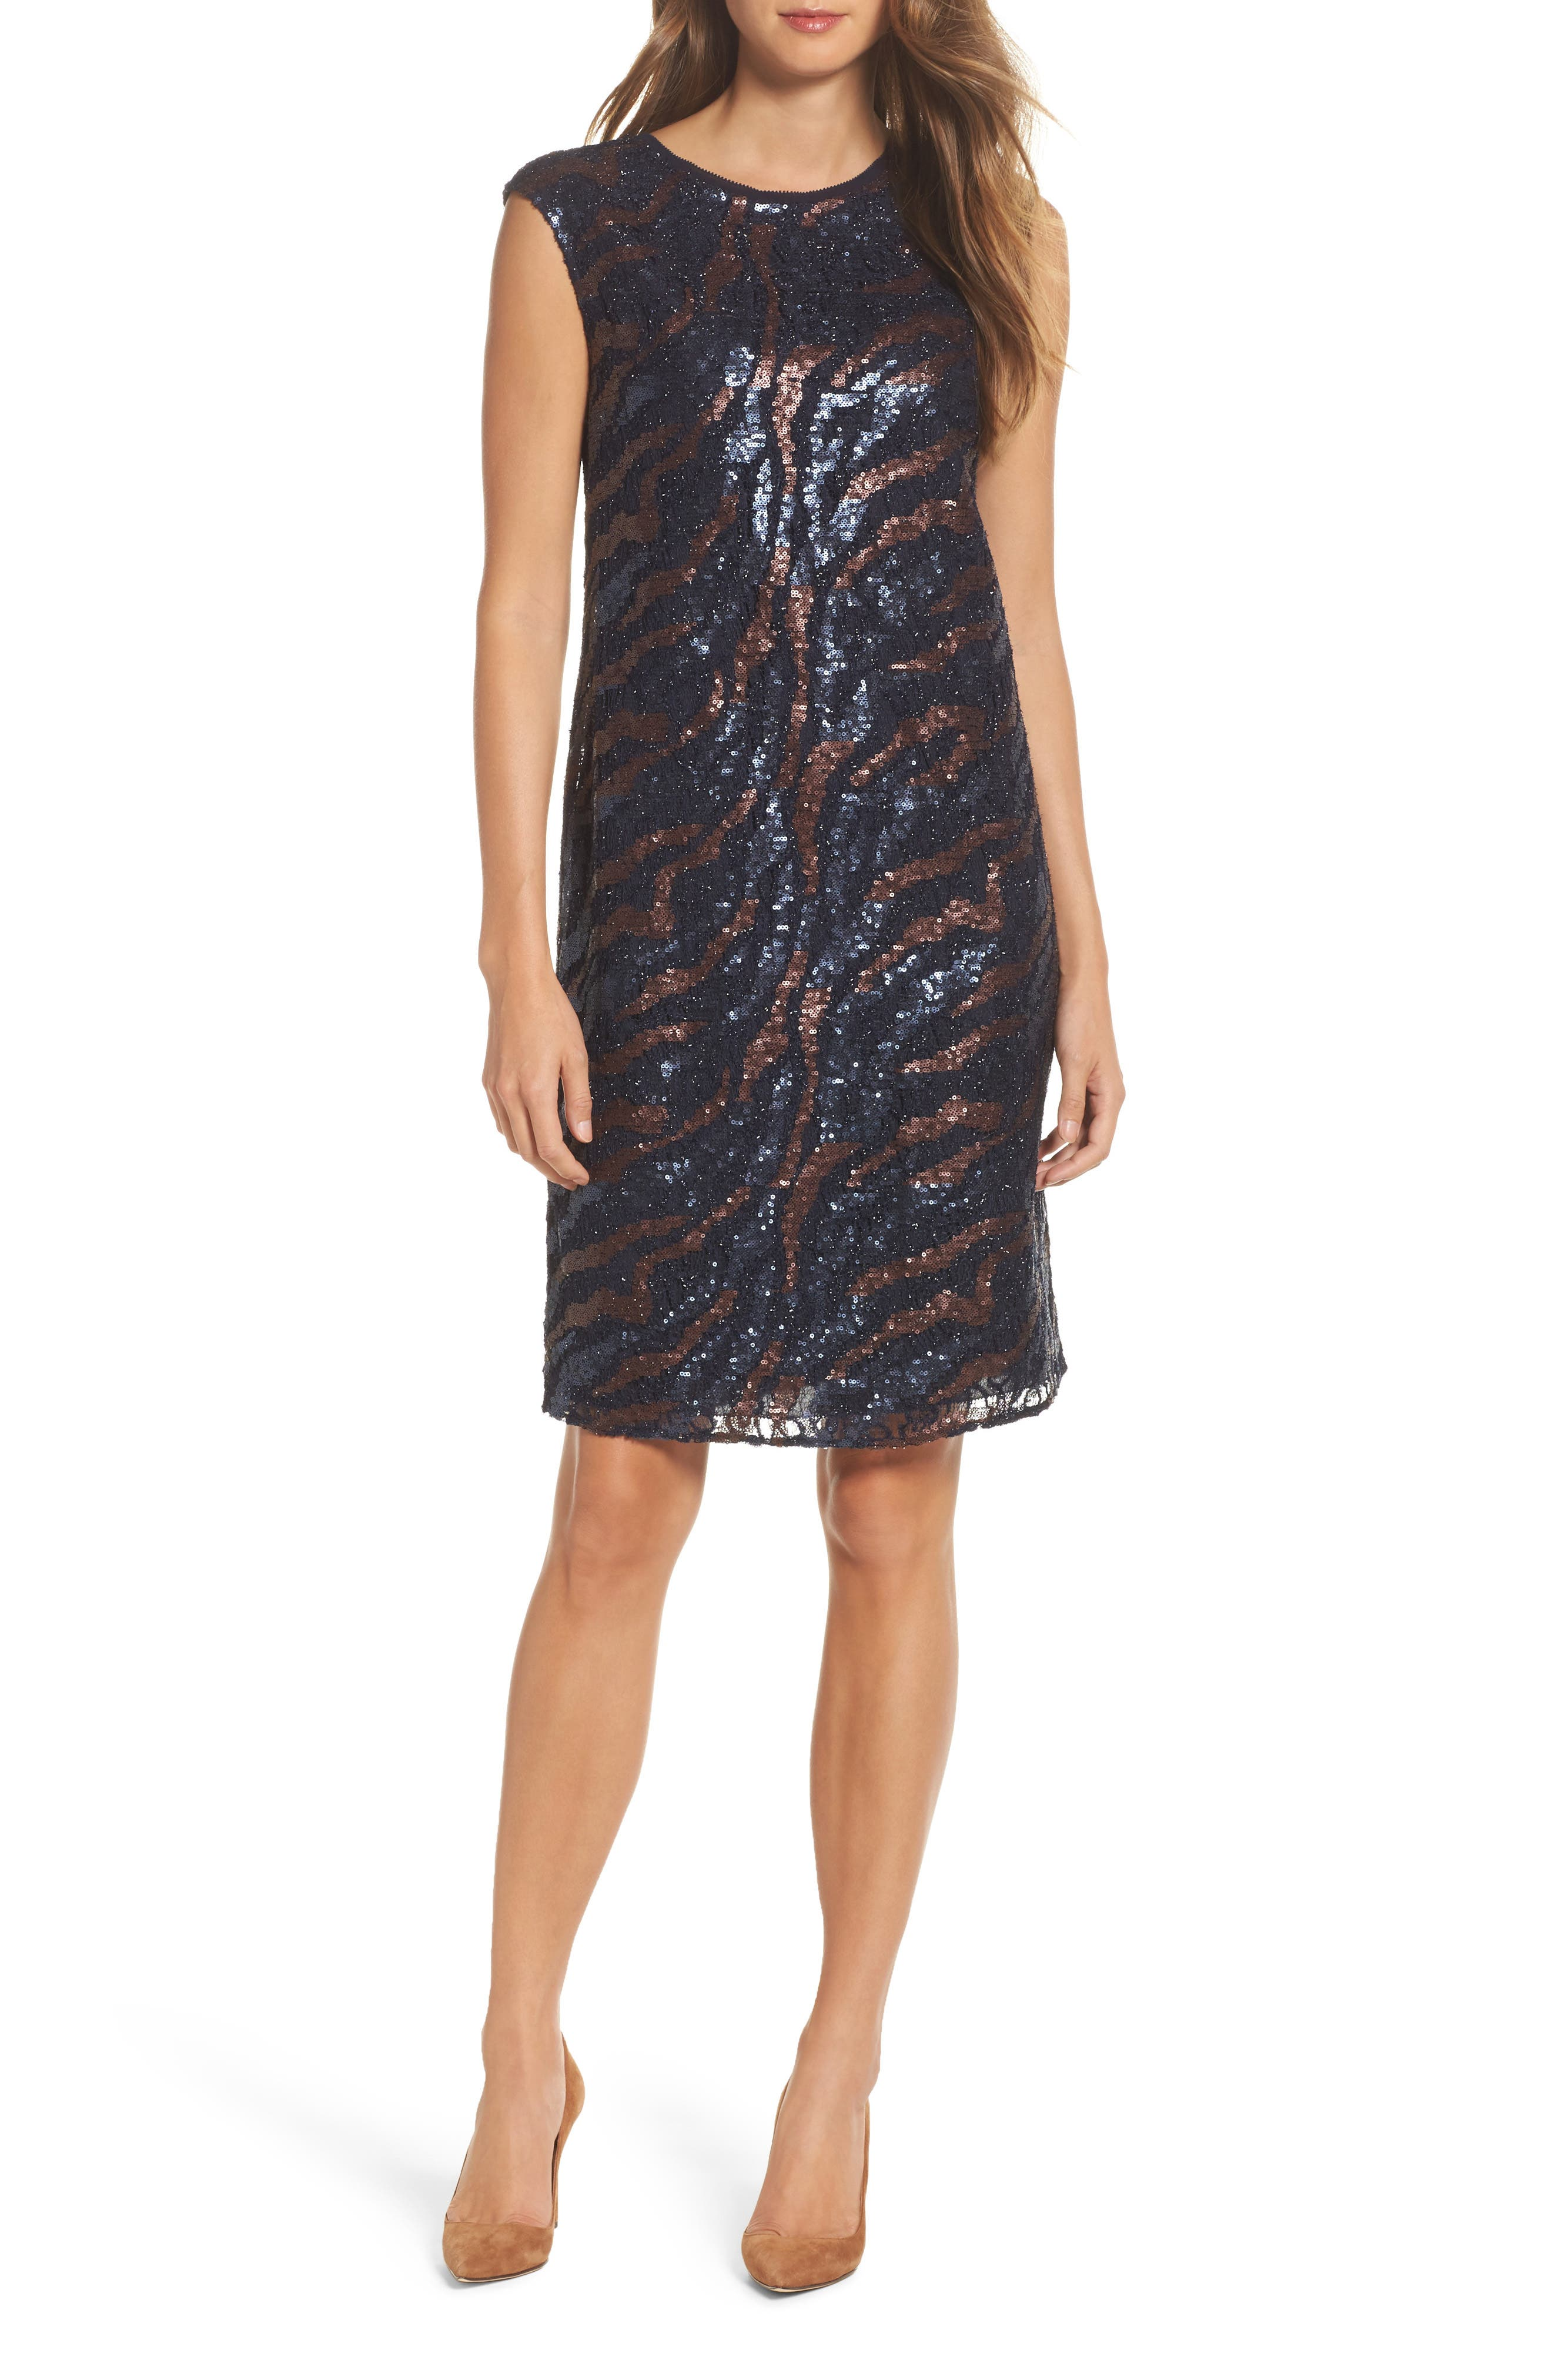 NIC + Zoe Sequin Lace Shift Dress